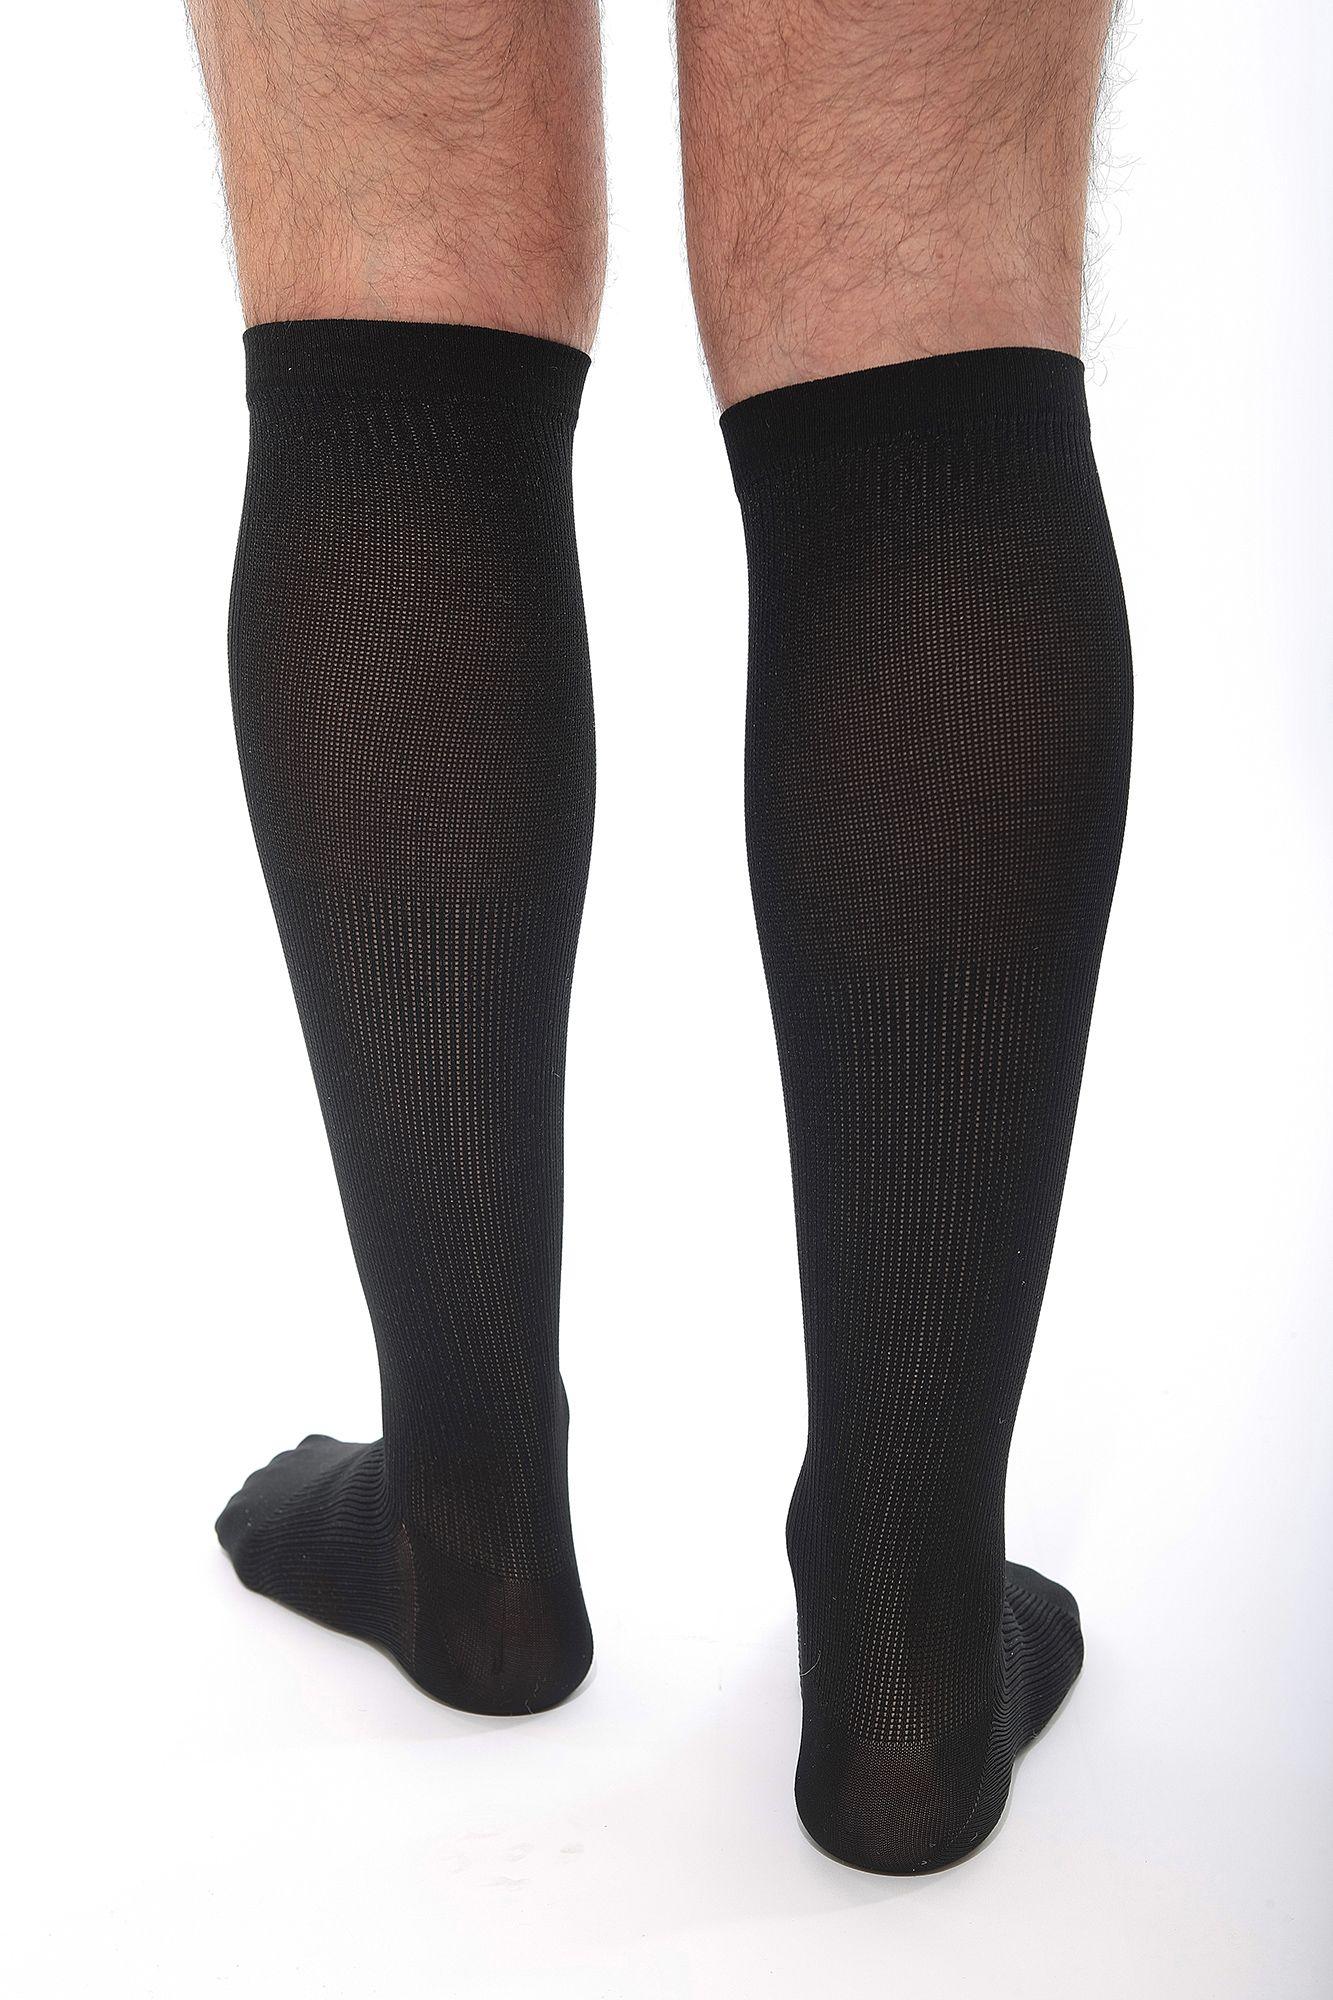 venosan174 silverline mens compression socks 2030mmhg daylong